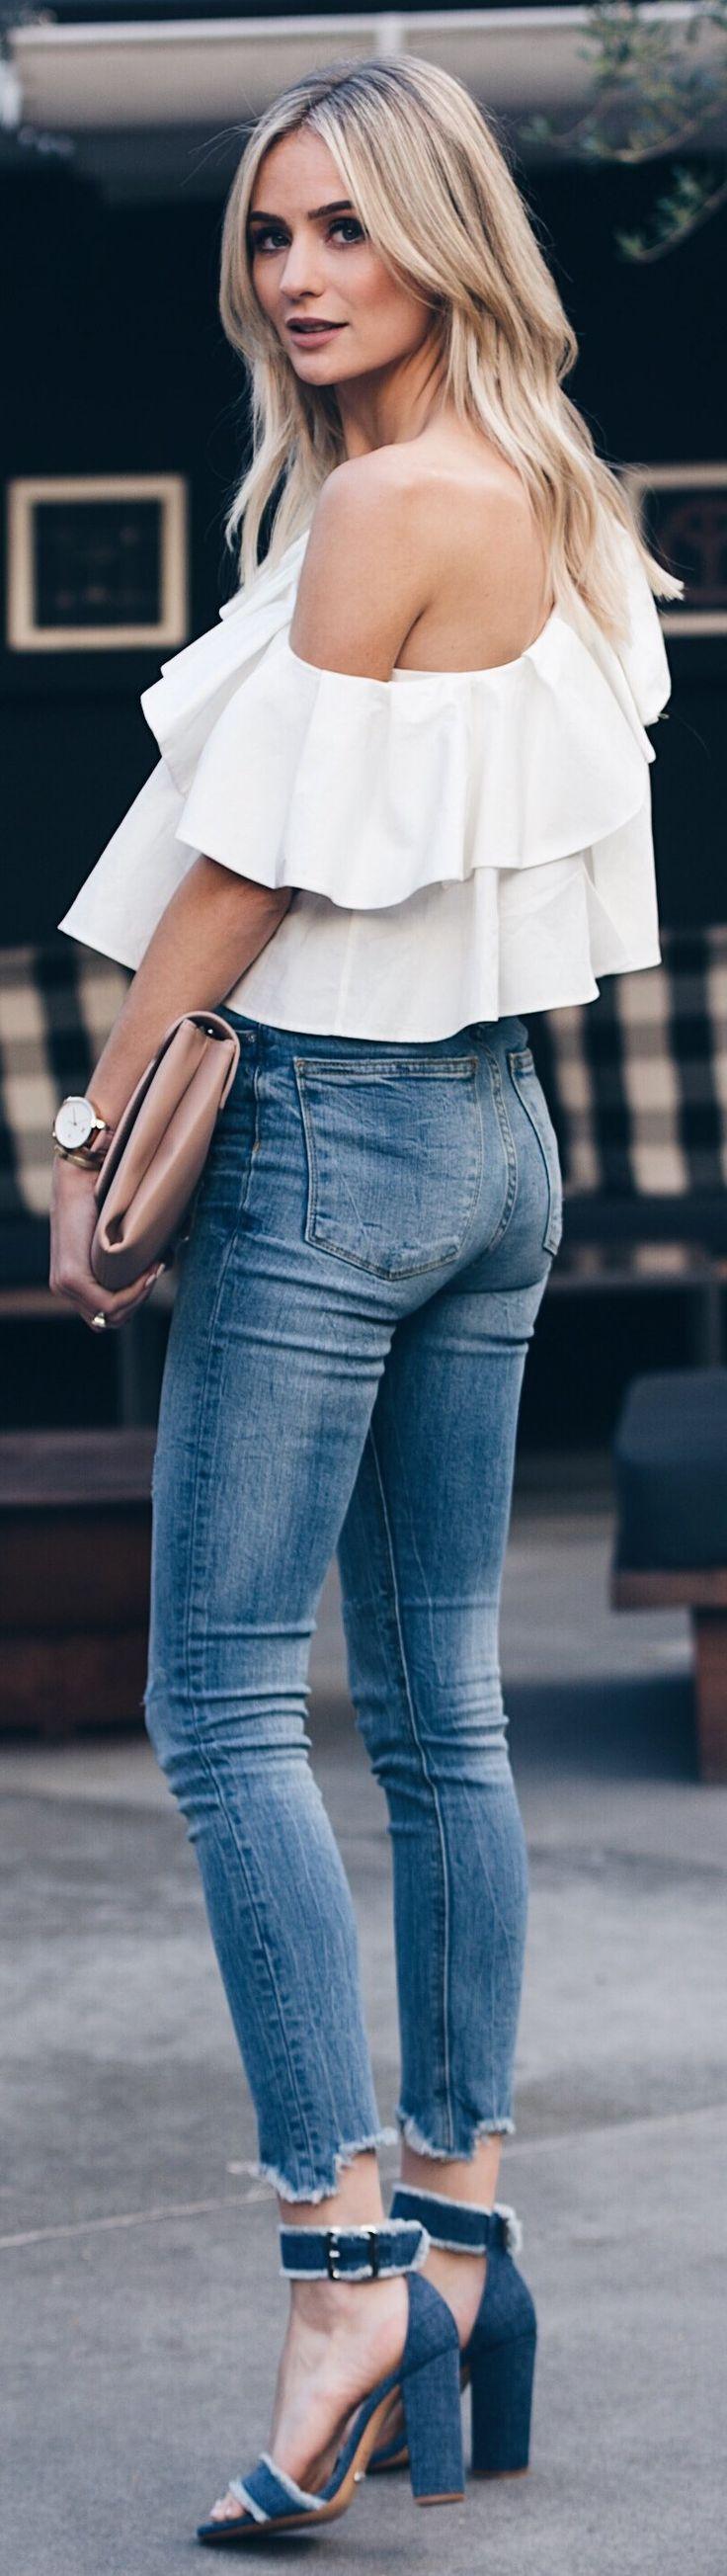 White Open Shoulder Blouse / Skinny Jeans / Navy Sandals